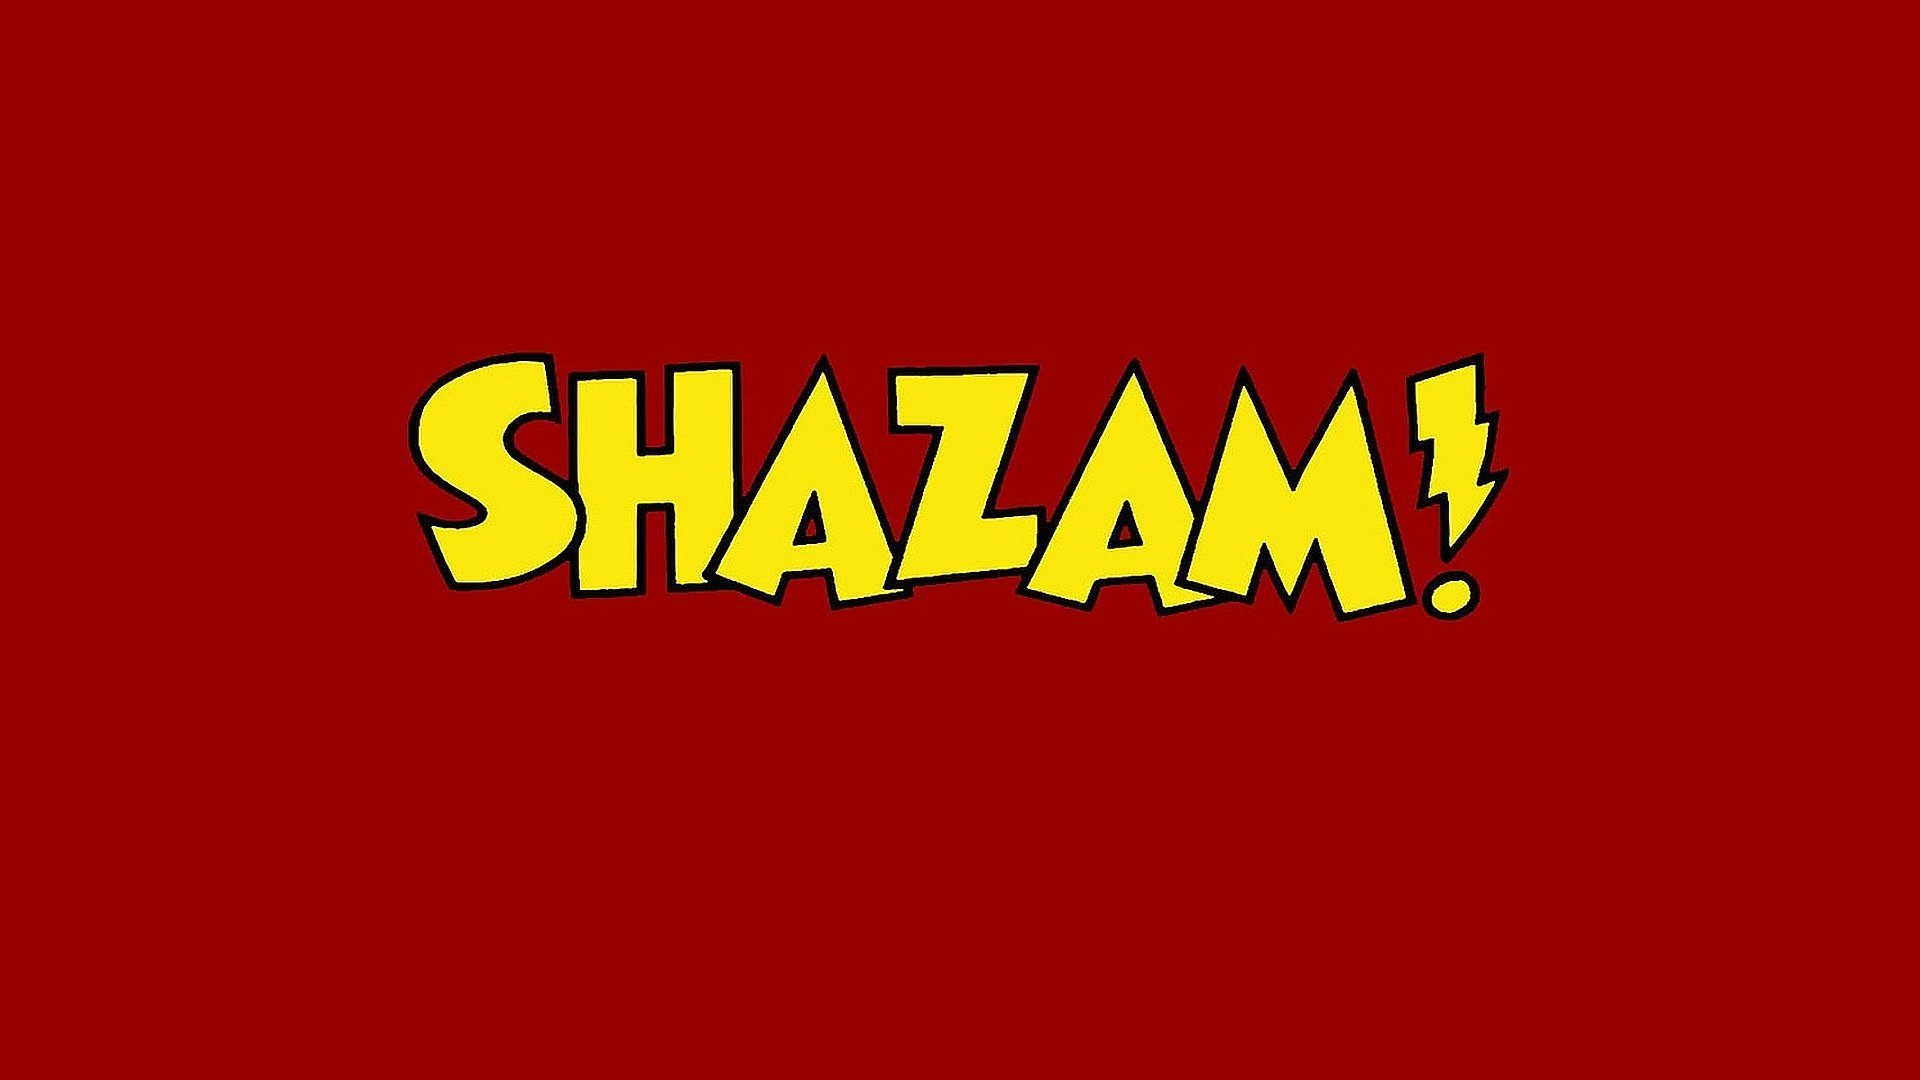 Shazam! HD Wallpaper   Background Image   1920x1080   ID